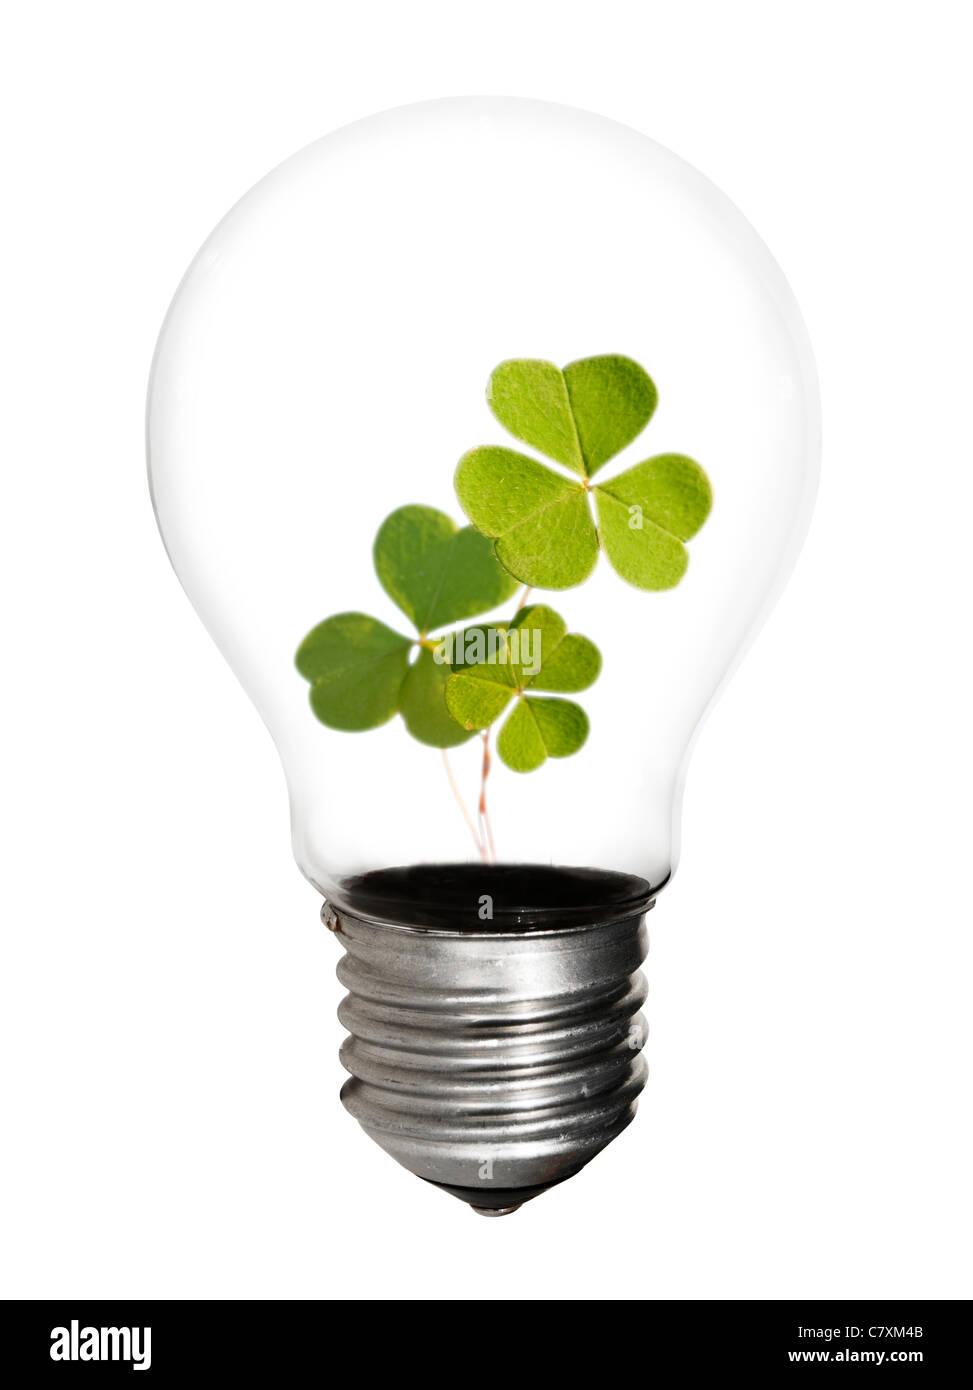 The future holds renewable energy - Stock Image